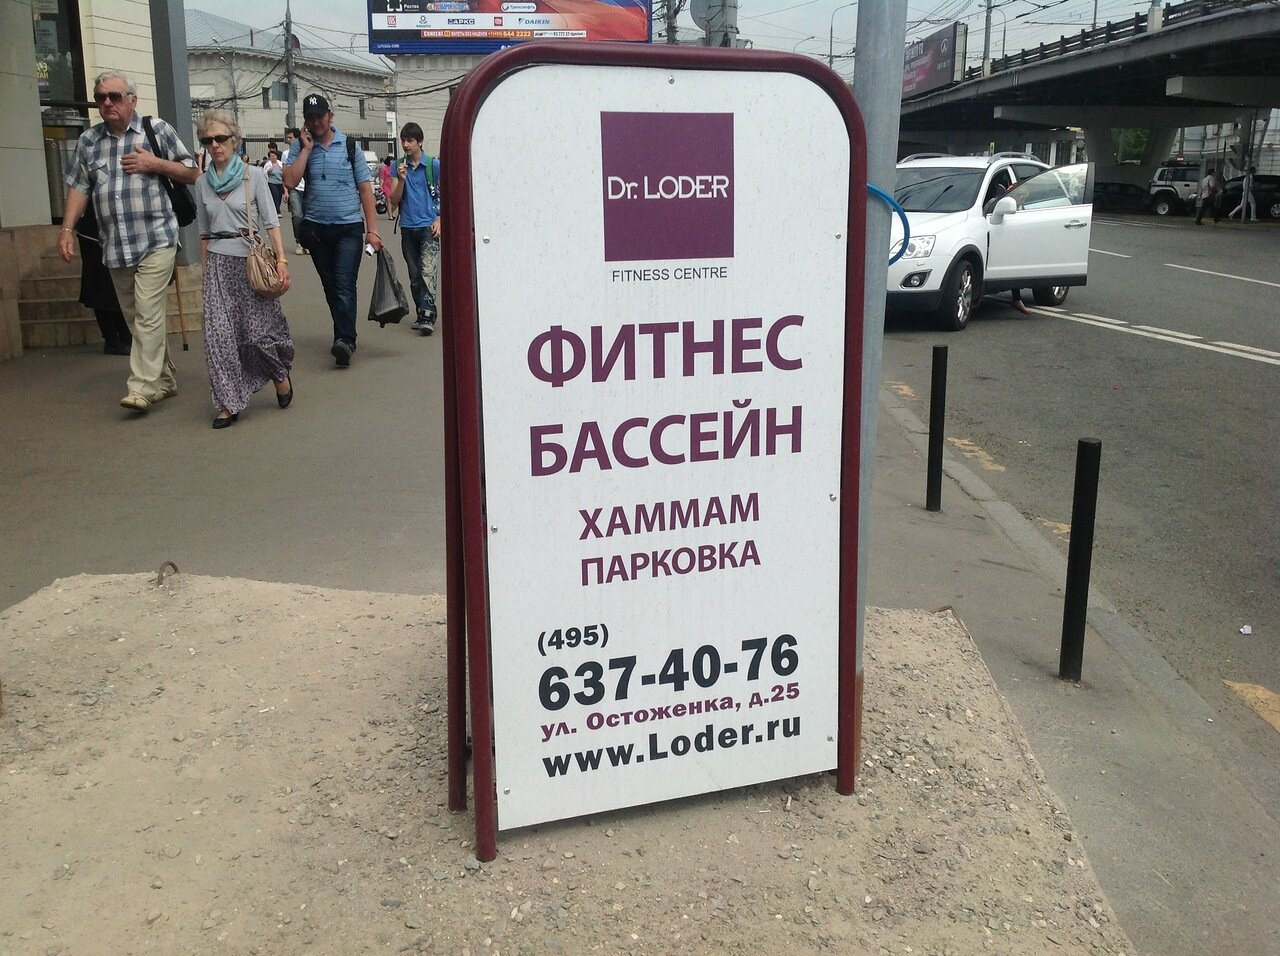 http://img-fotki.yandex.ru/get/9170/82260854.27c/0_9dfec_e9e6d98f_XXXL.jpg